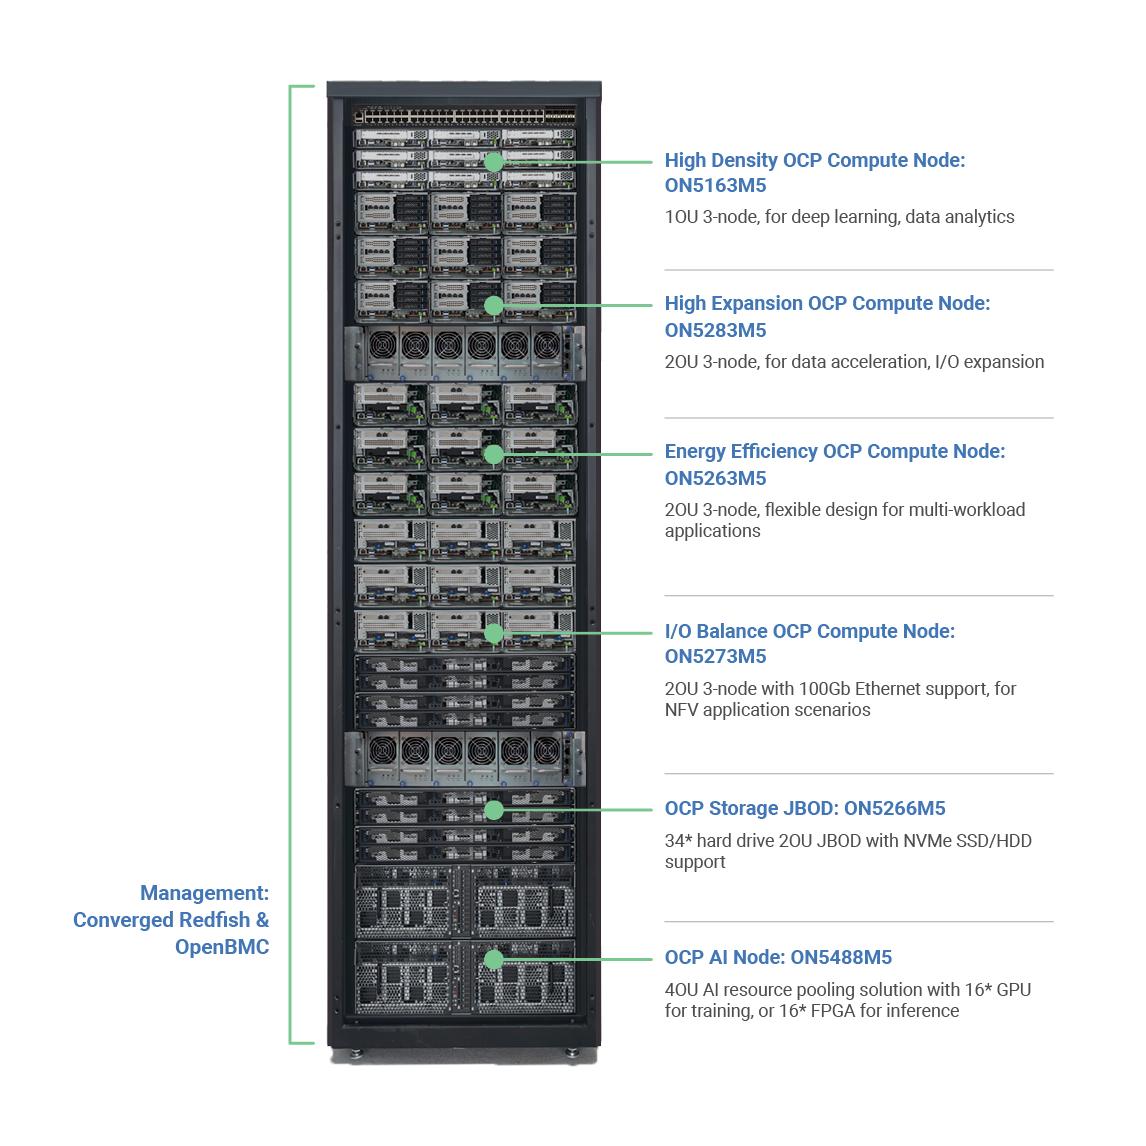 Inspur brings AI tech into OCP servers - DCD